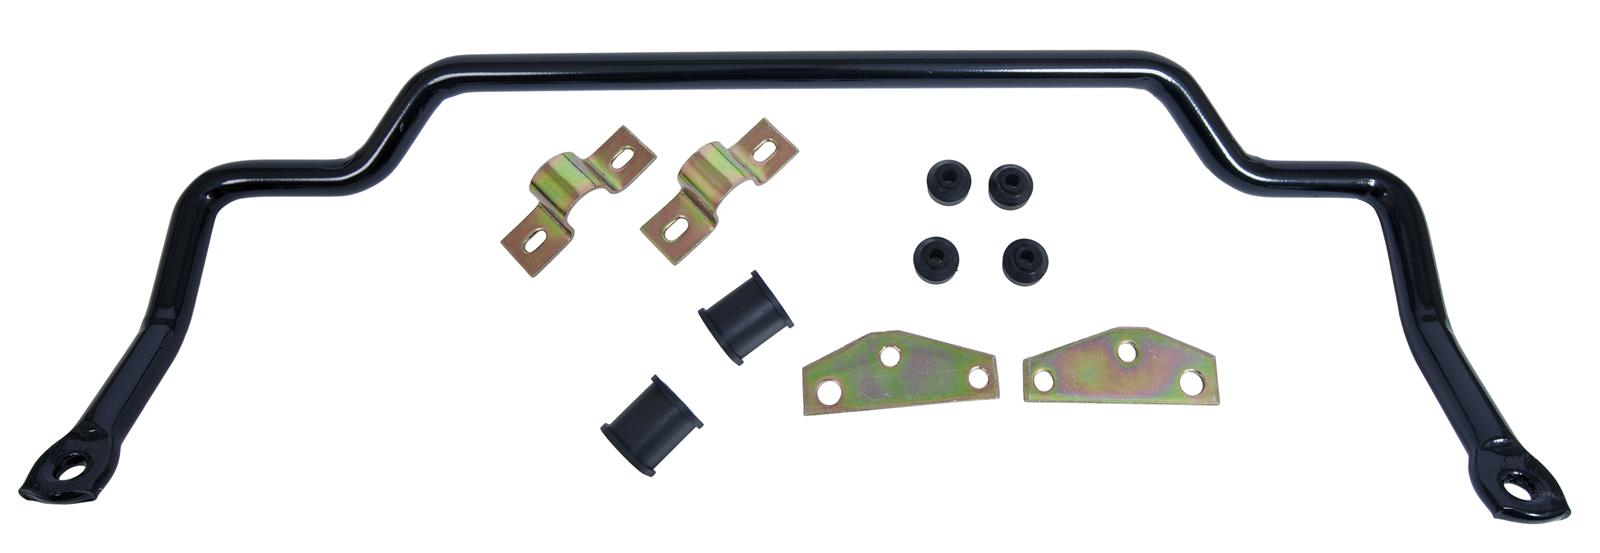 Diameter Fits Jeep Kit Addco 684 Sway Bar Rear Steel Black Powdercoated 1 in